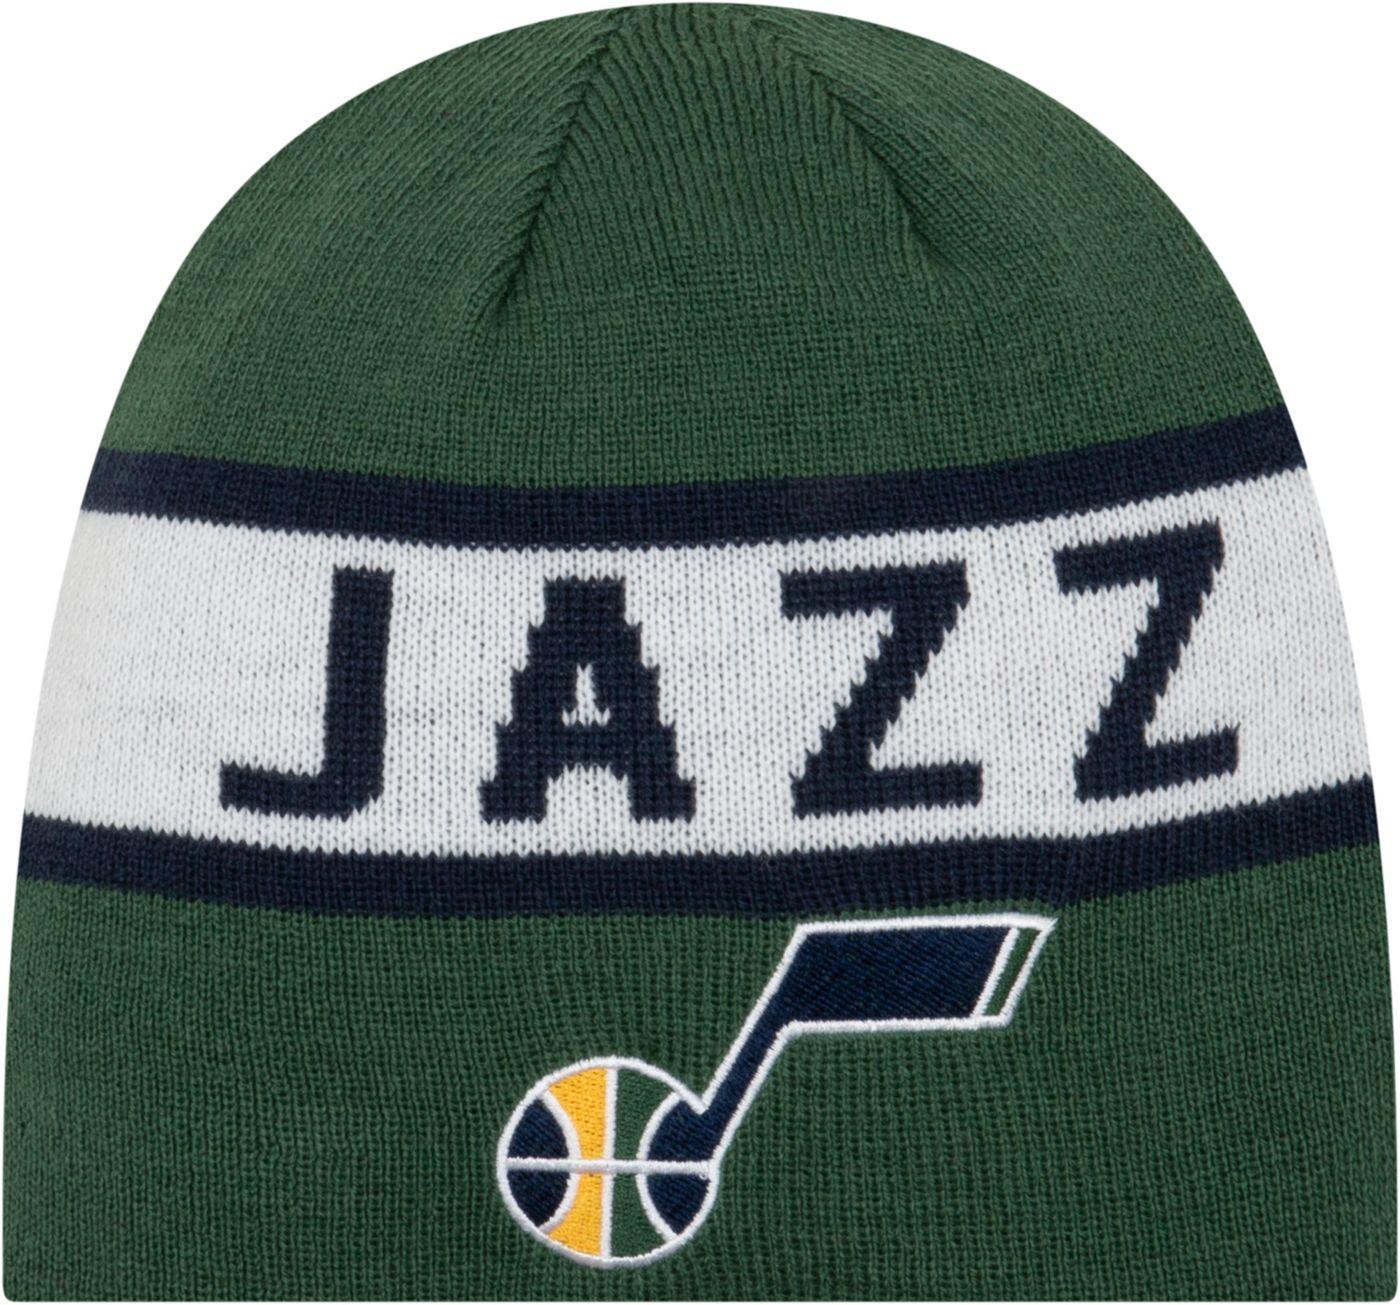 New Era Men's Utah Jazz Reversible Sports Knit Hat